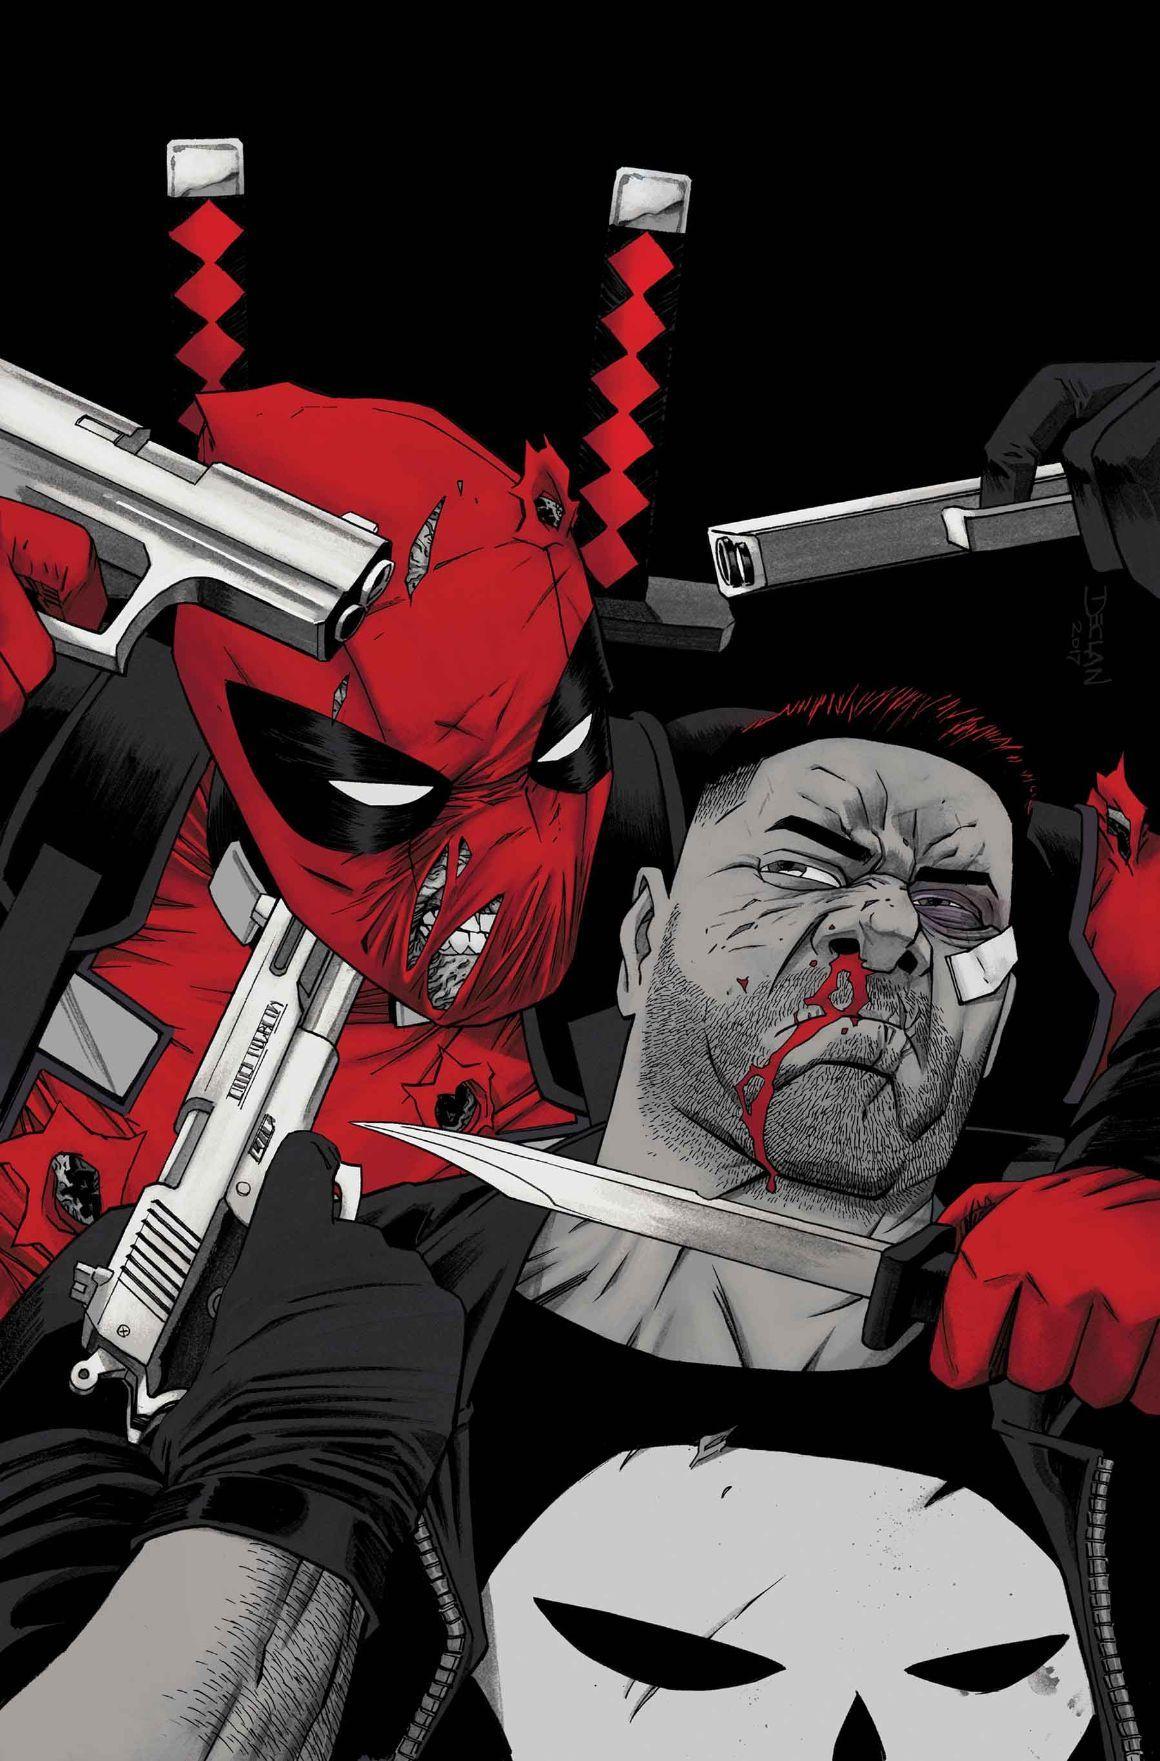 #Deadpool #Fan #Art. Deadpool vs. The Punisher (2017) #3 (of 5) Cover) By: Declan Shalvey. ÅWESOMENESS!!!™ ÅÅÅ+